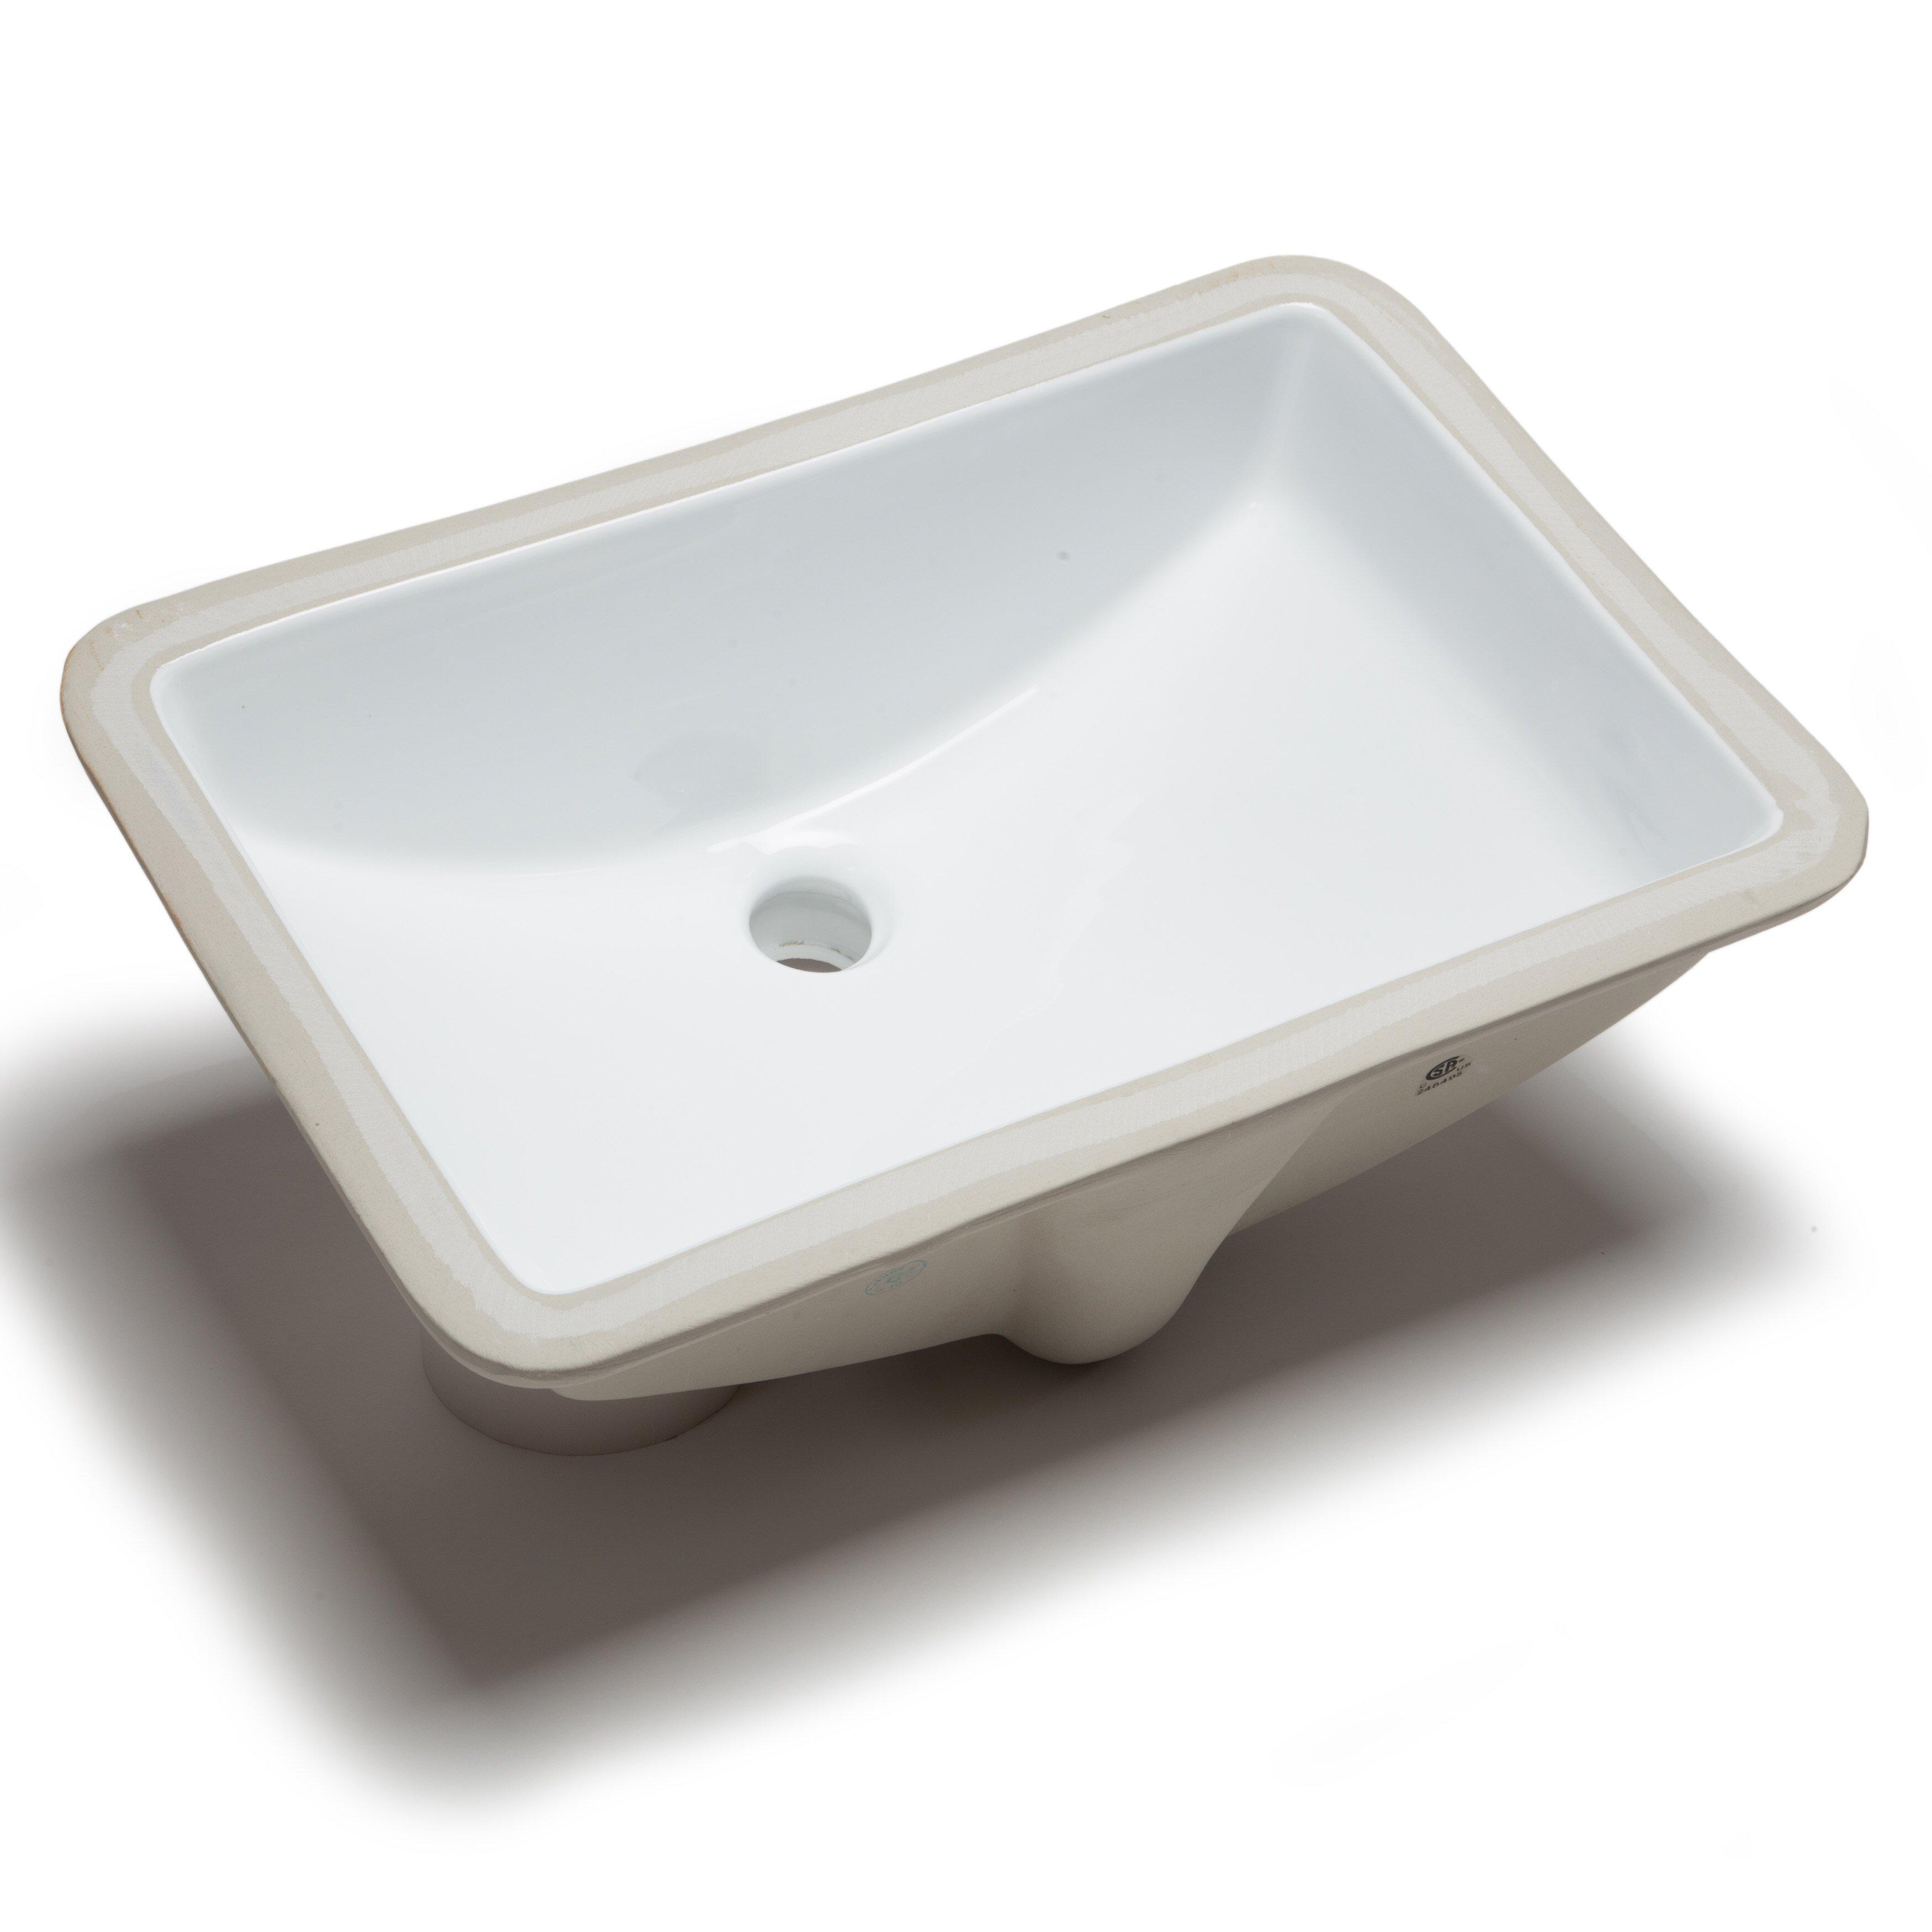 Hahn Ceramic Bowl Rectangular Undermount Bathroom Sink With Overflow Reviews